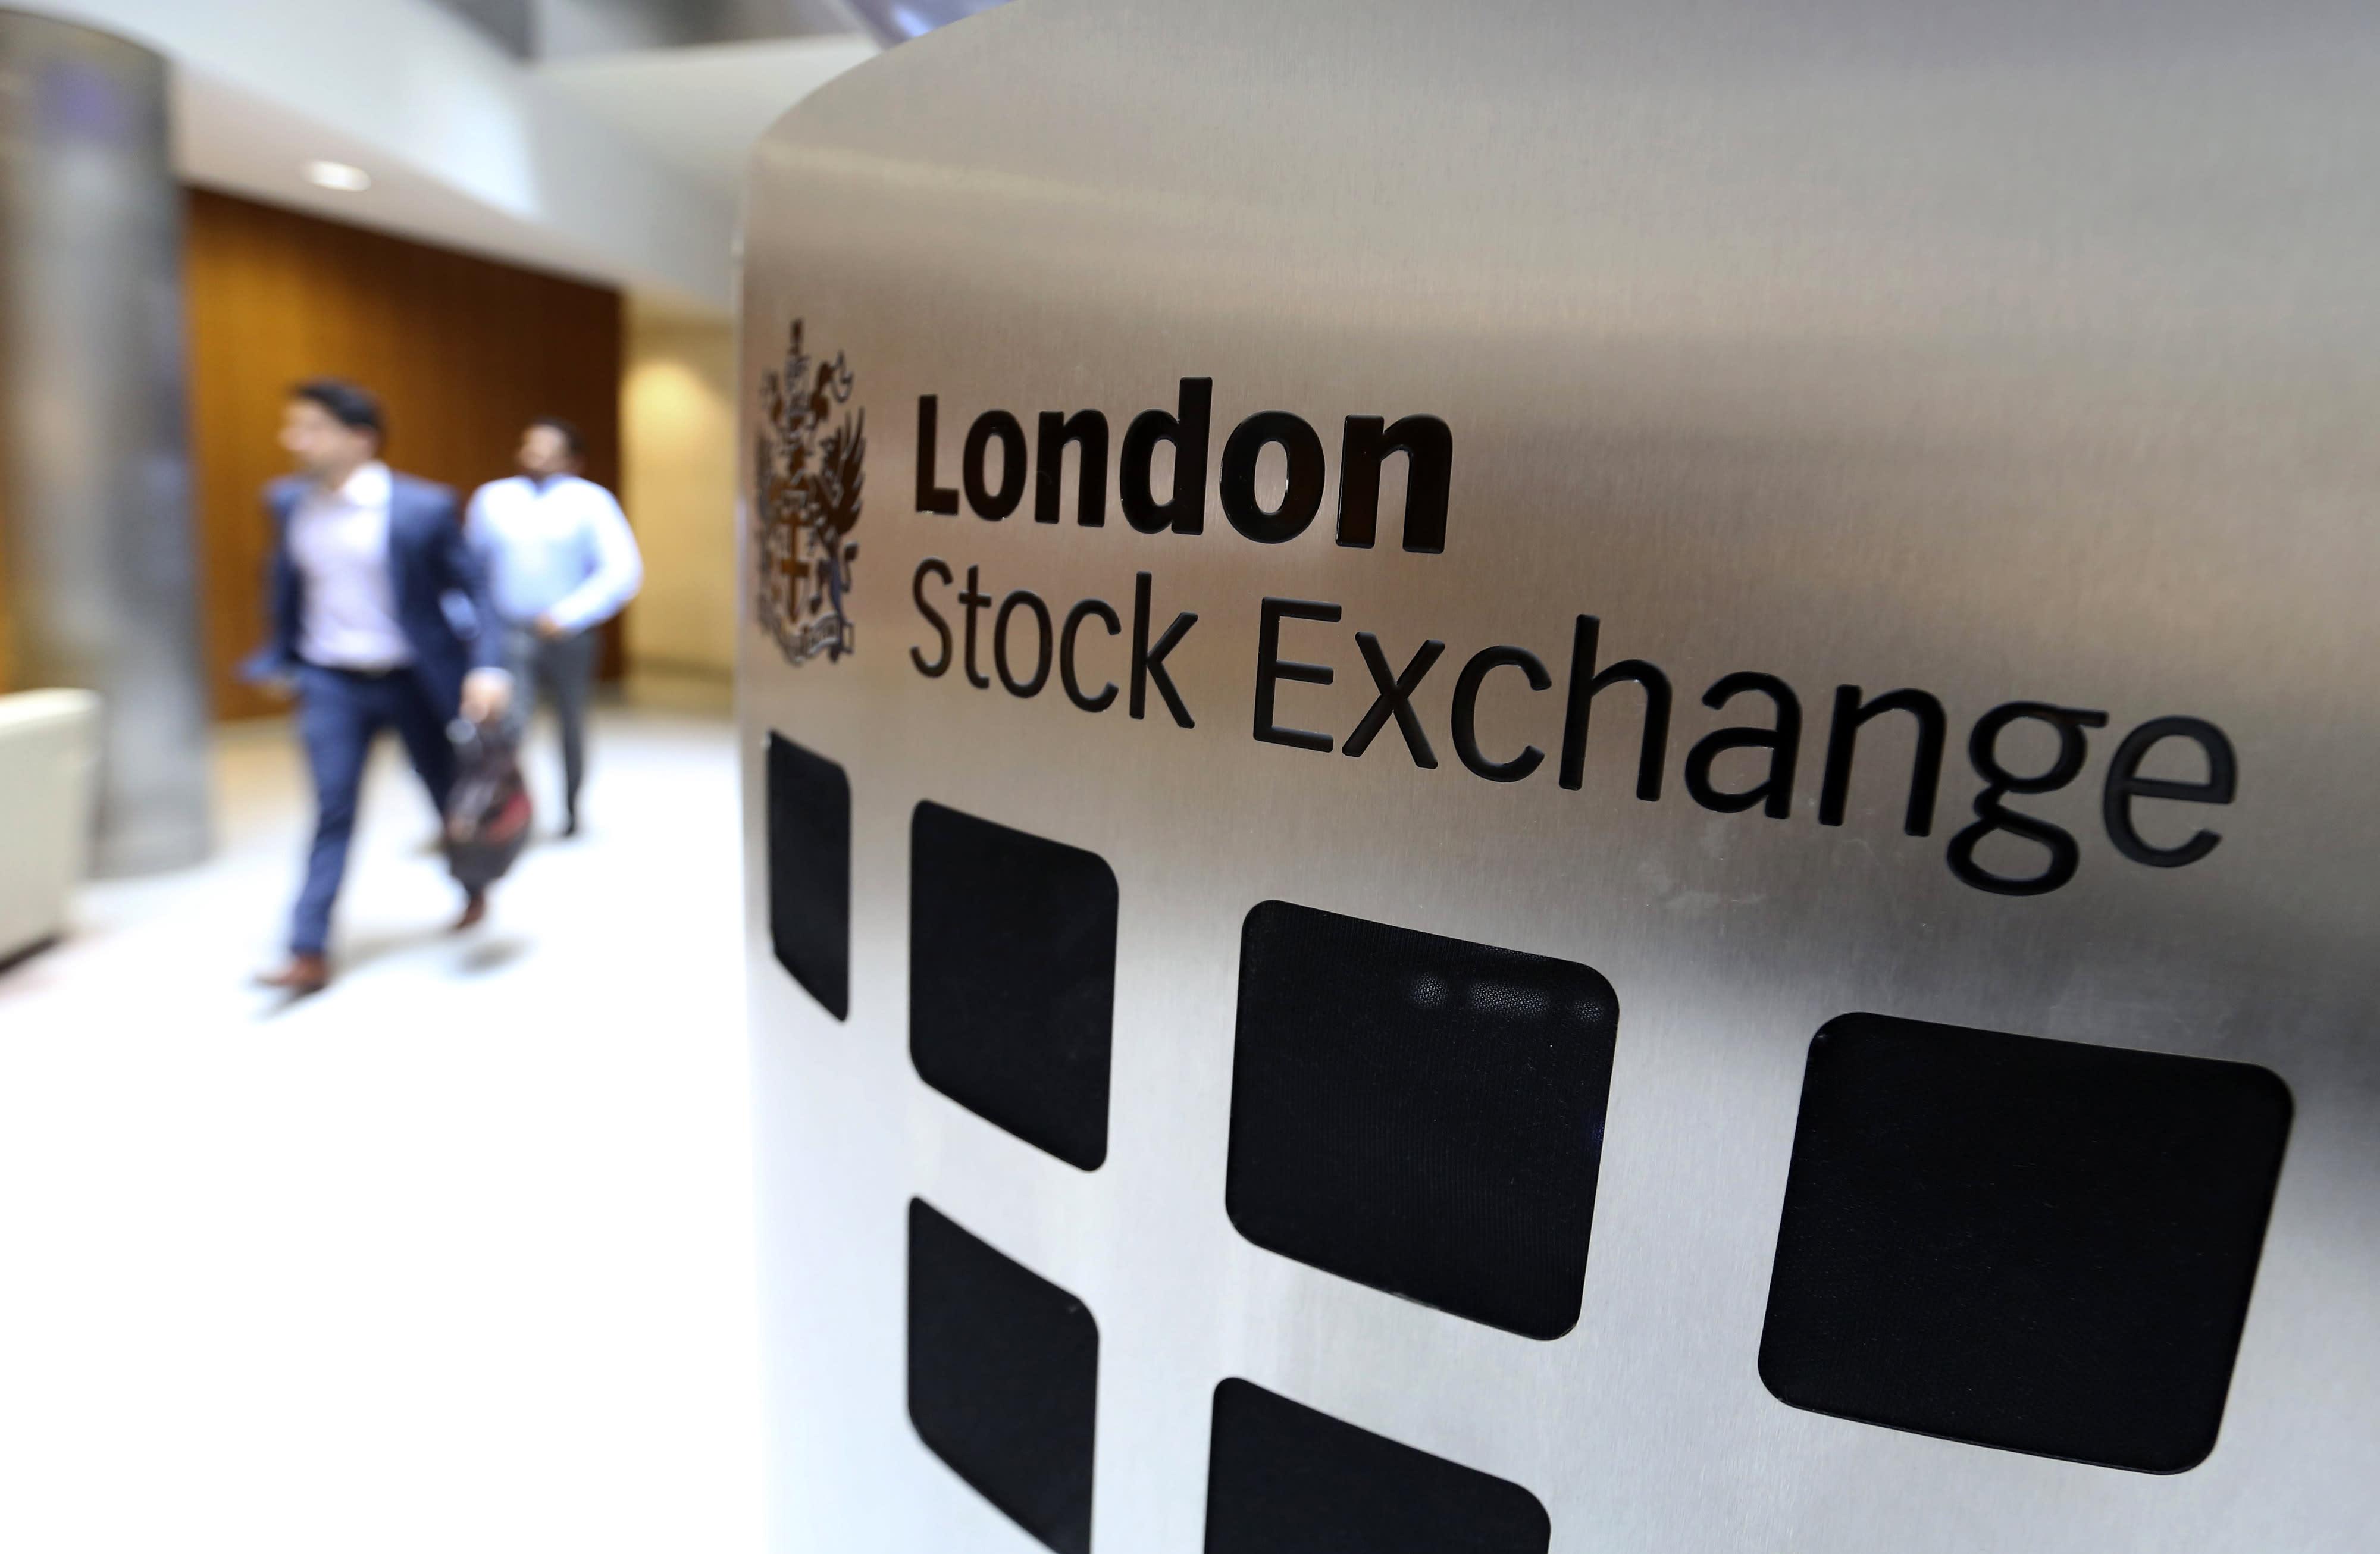 London Stock Exchange agrees to buy Refinitiv in $27 billion deal thumbnail